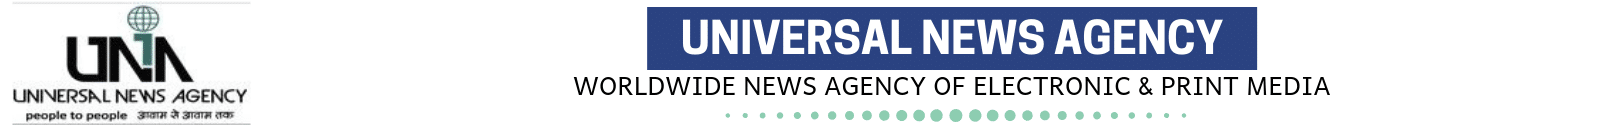 Universal News Agency